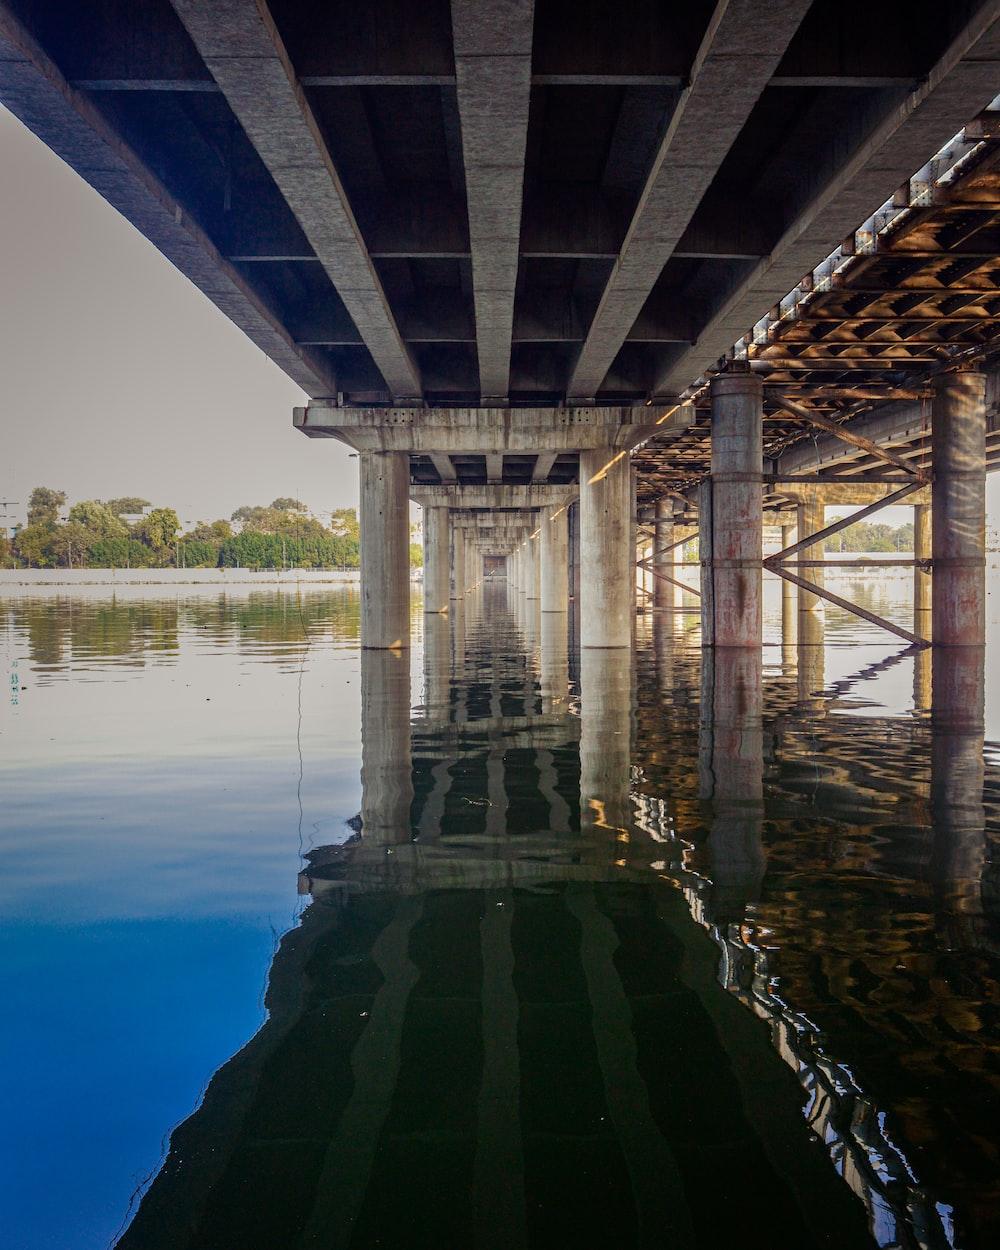 brown wooden bridge over the lake